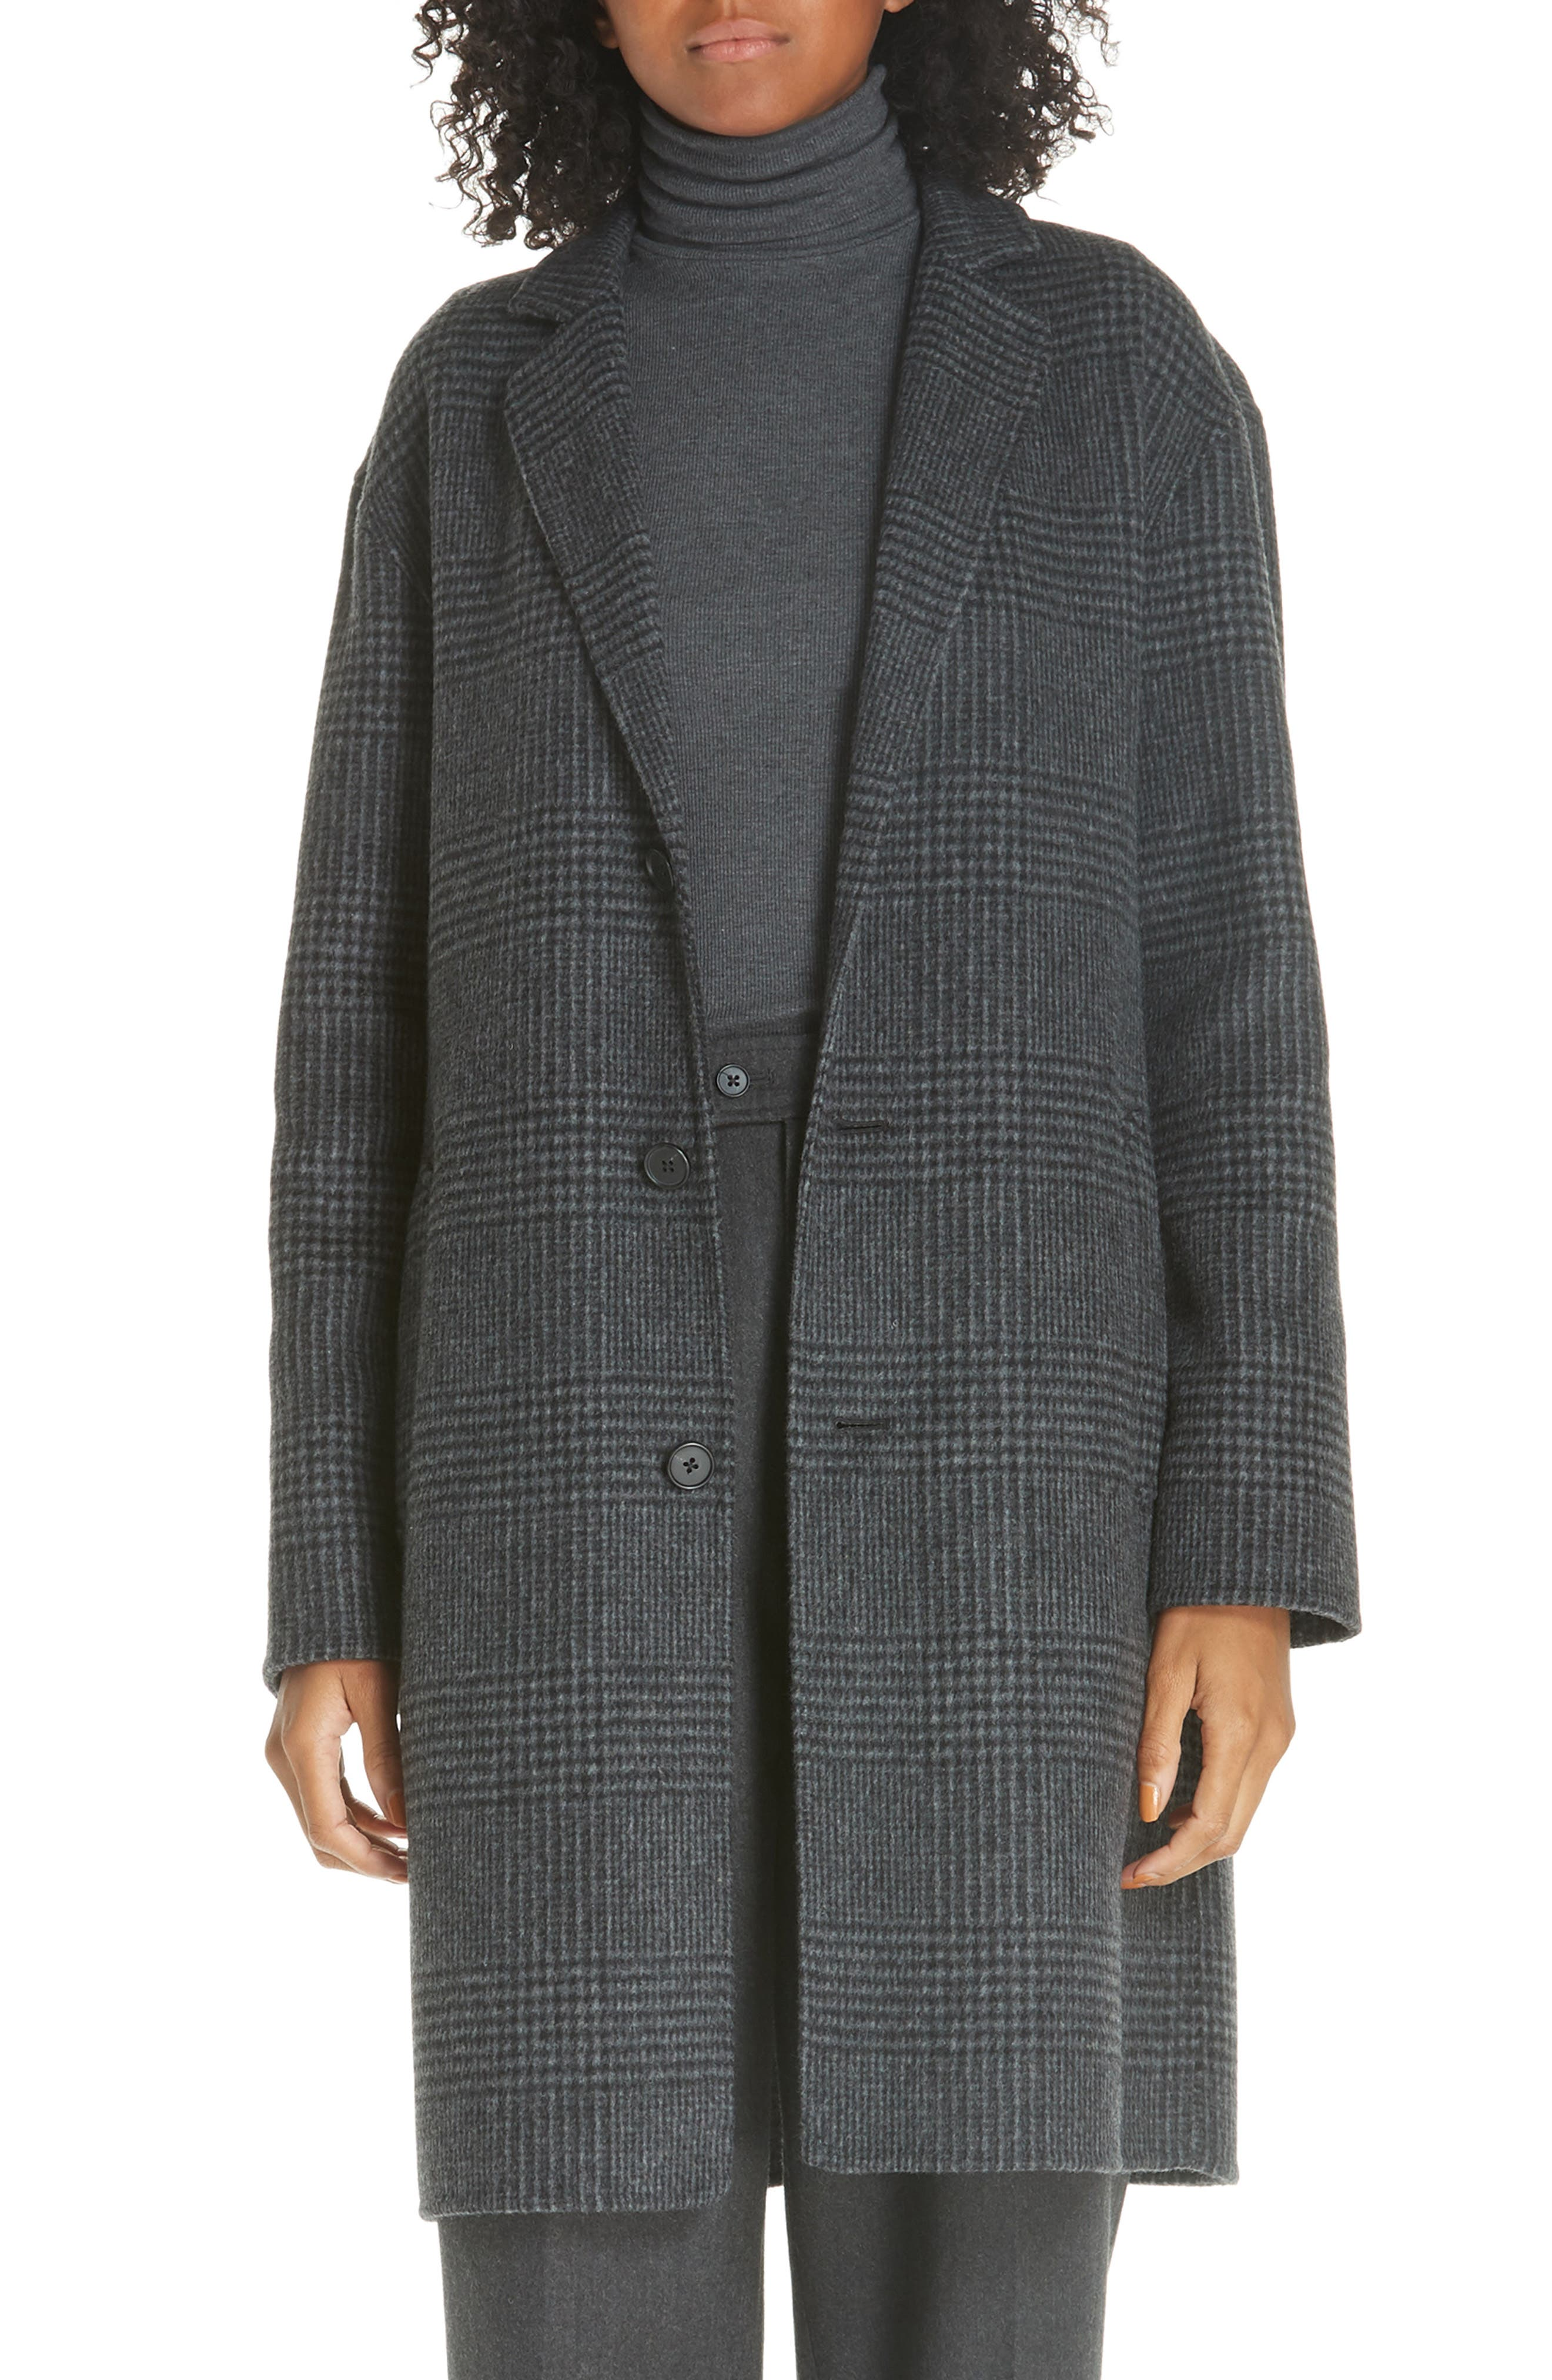 Plaid Wool Blend Coat,                         Main,                         color, CHARCOAL GLEN PLAID